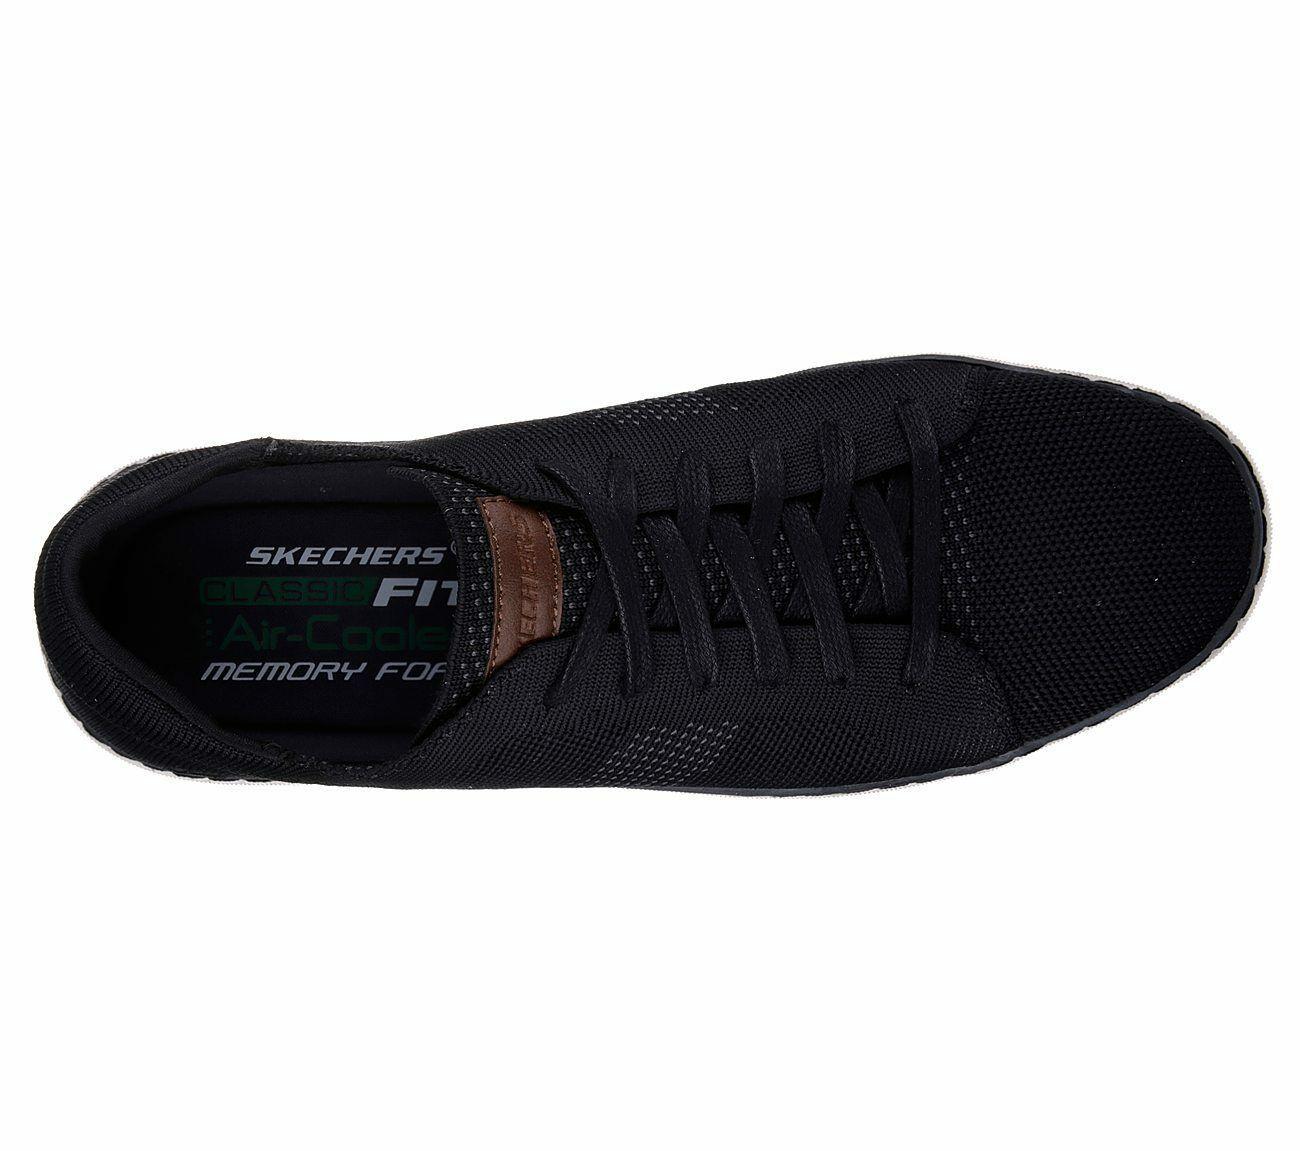 65088, SKECHERS, Lanson Revero, USA Men's Lace Up, Classic Fit, Casual Shoes image 5